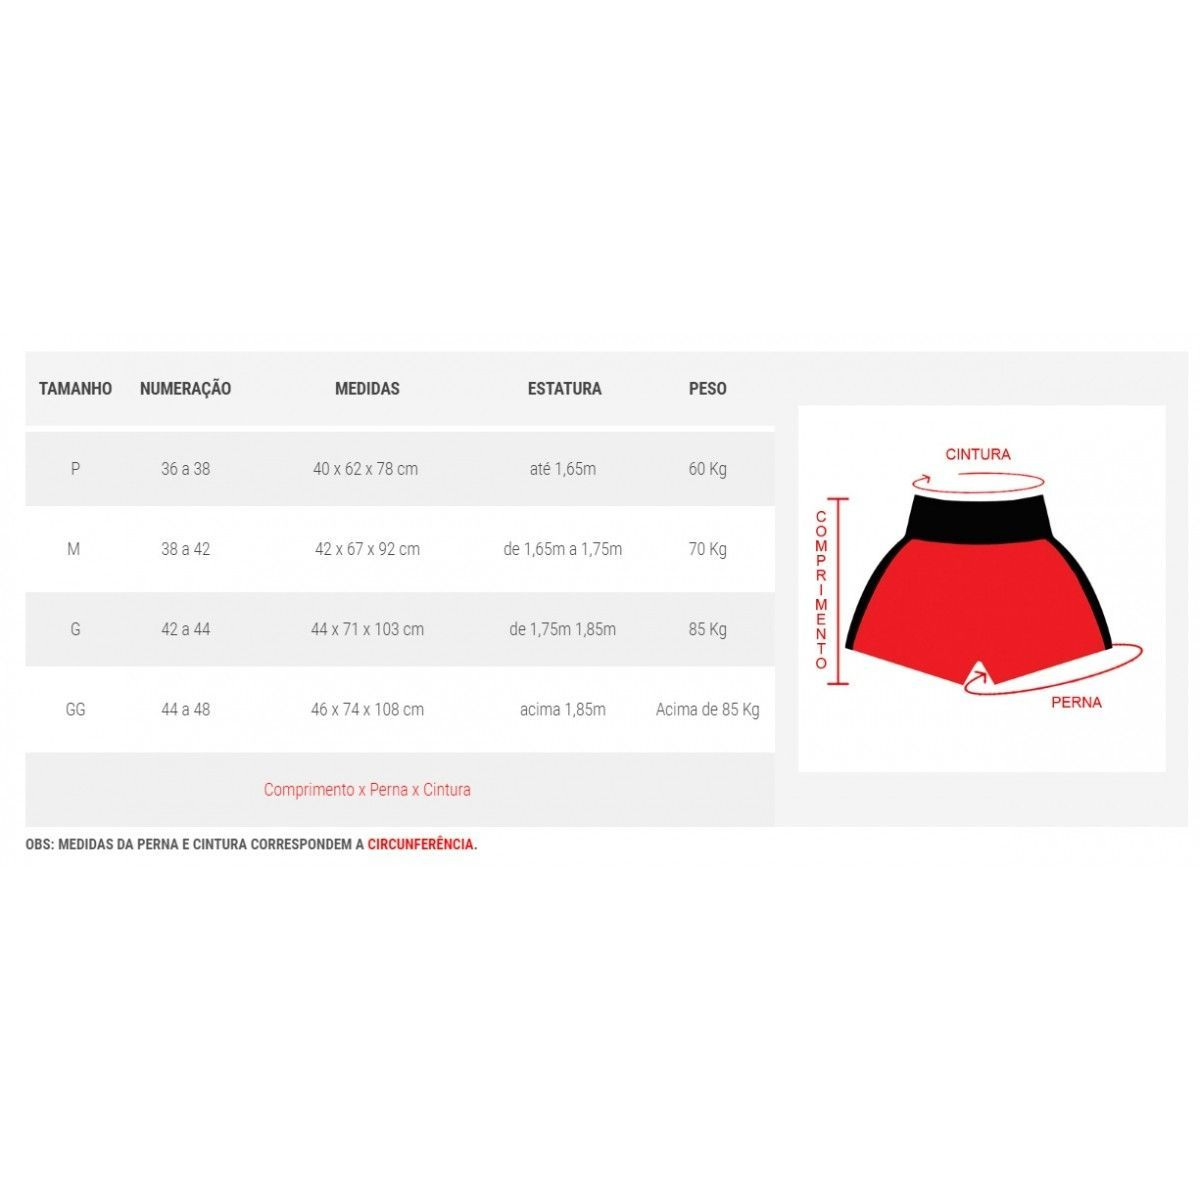 Calção / Short Kickboxing - New Kicks MMA - Preto - Toriuk  - Loja do Competidor